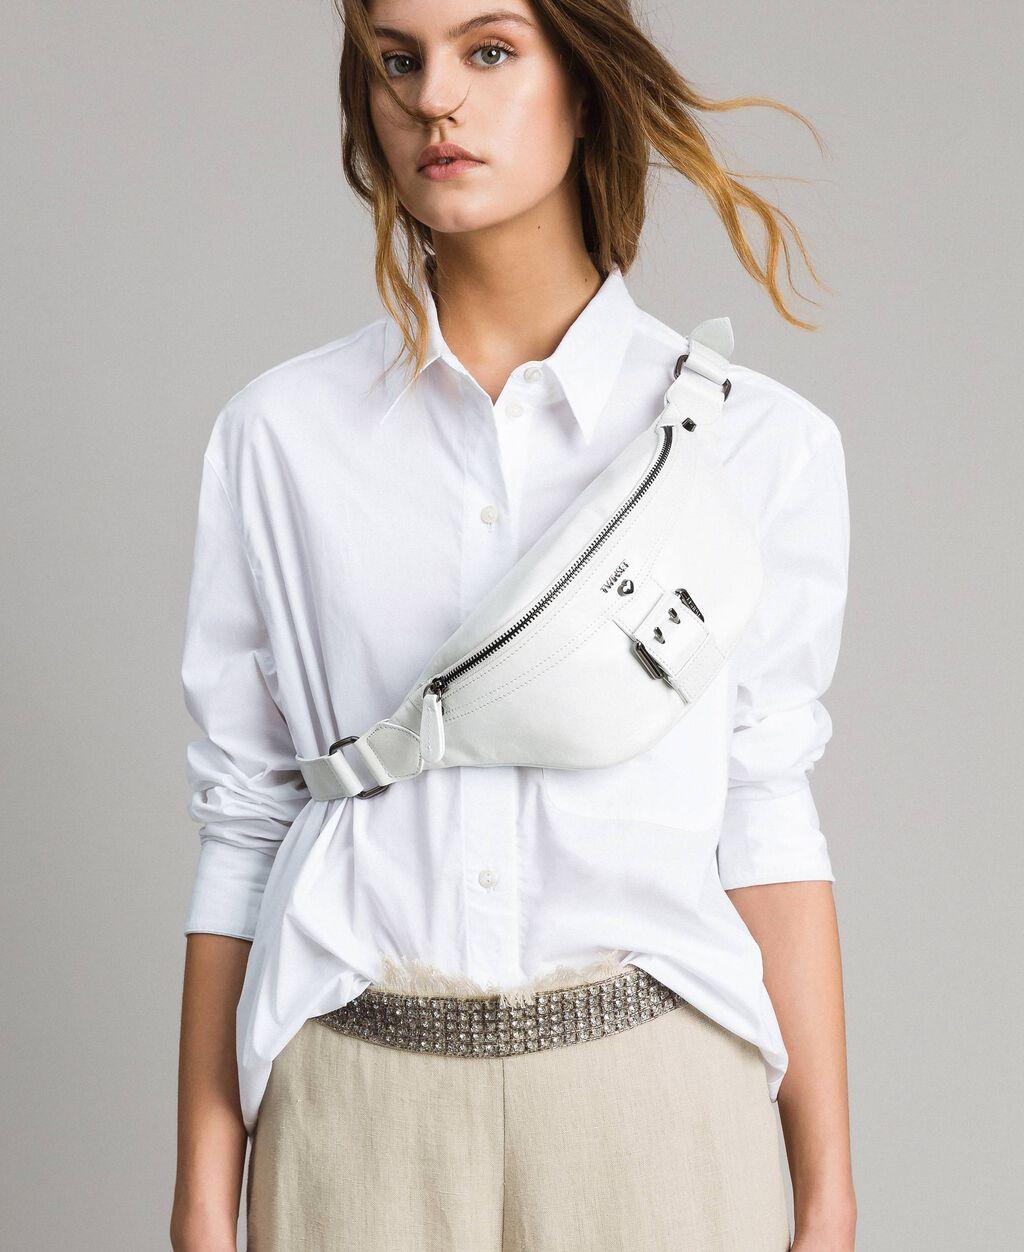 Rebel leather bum bag